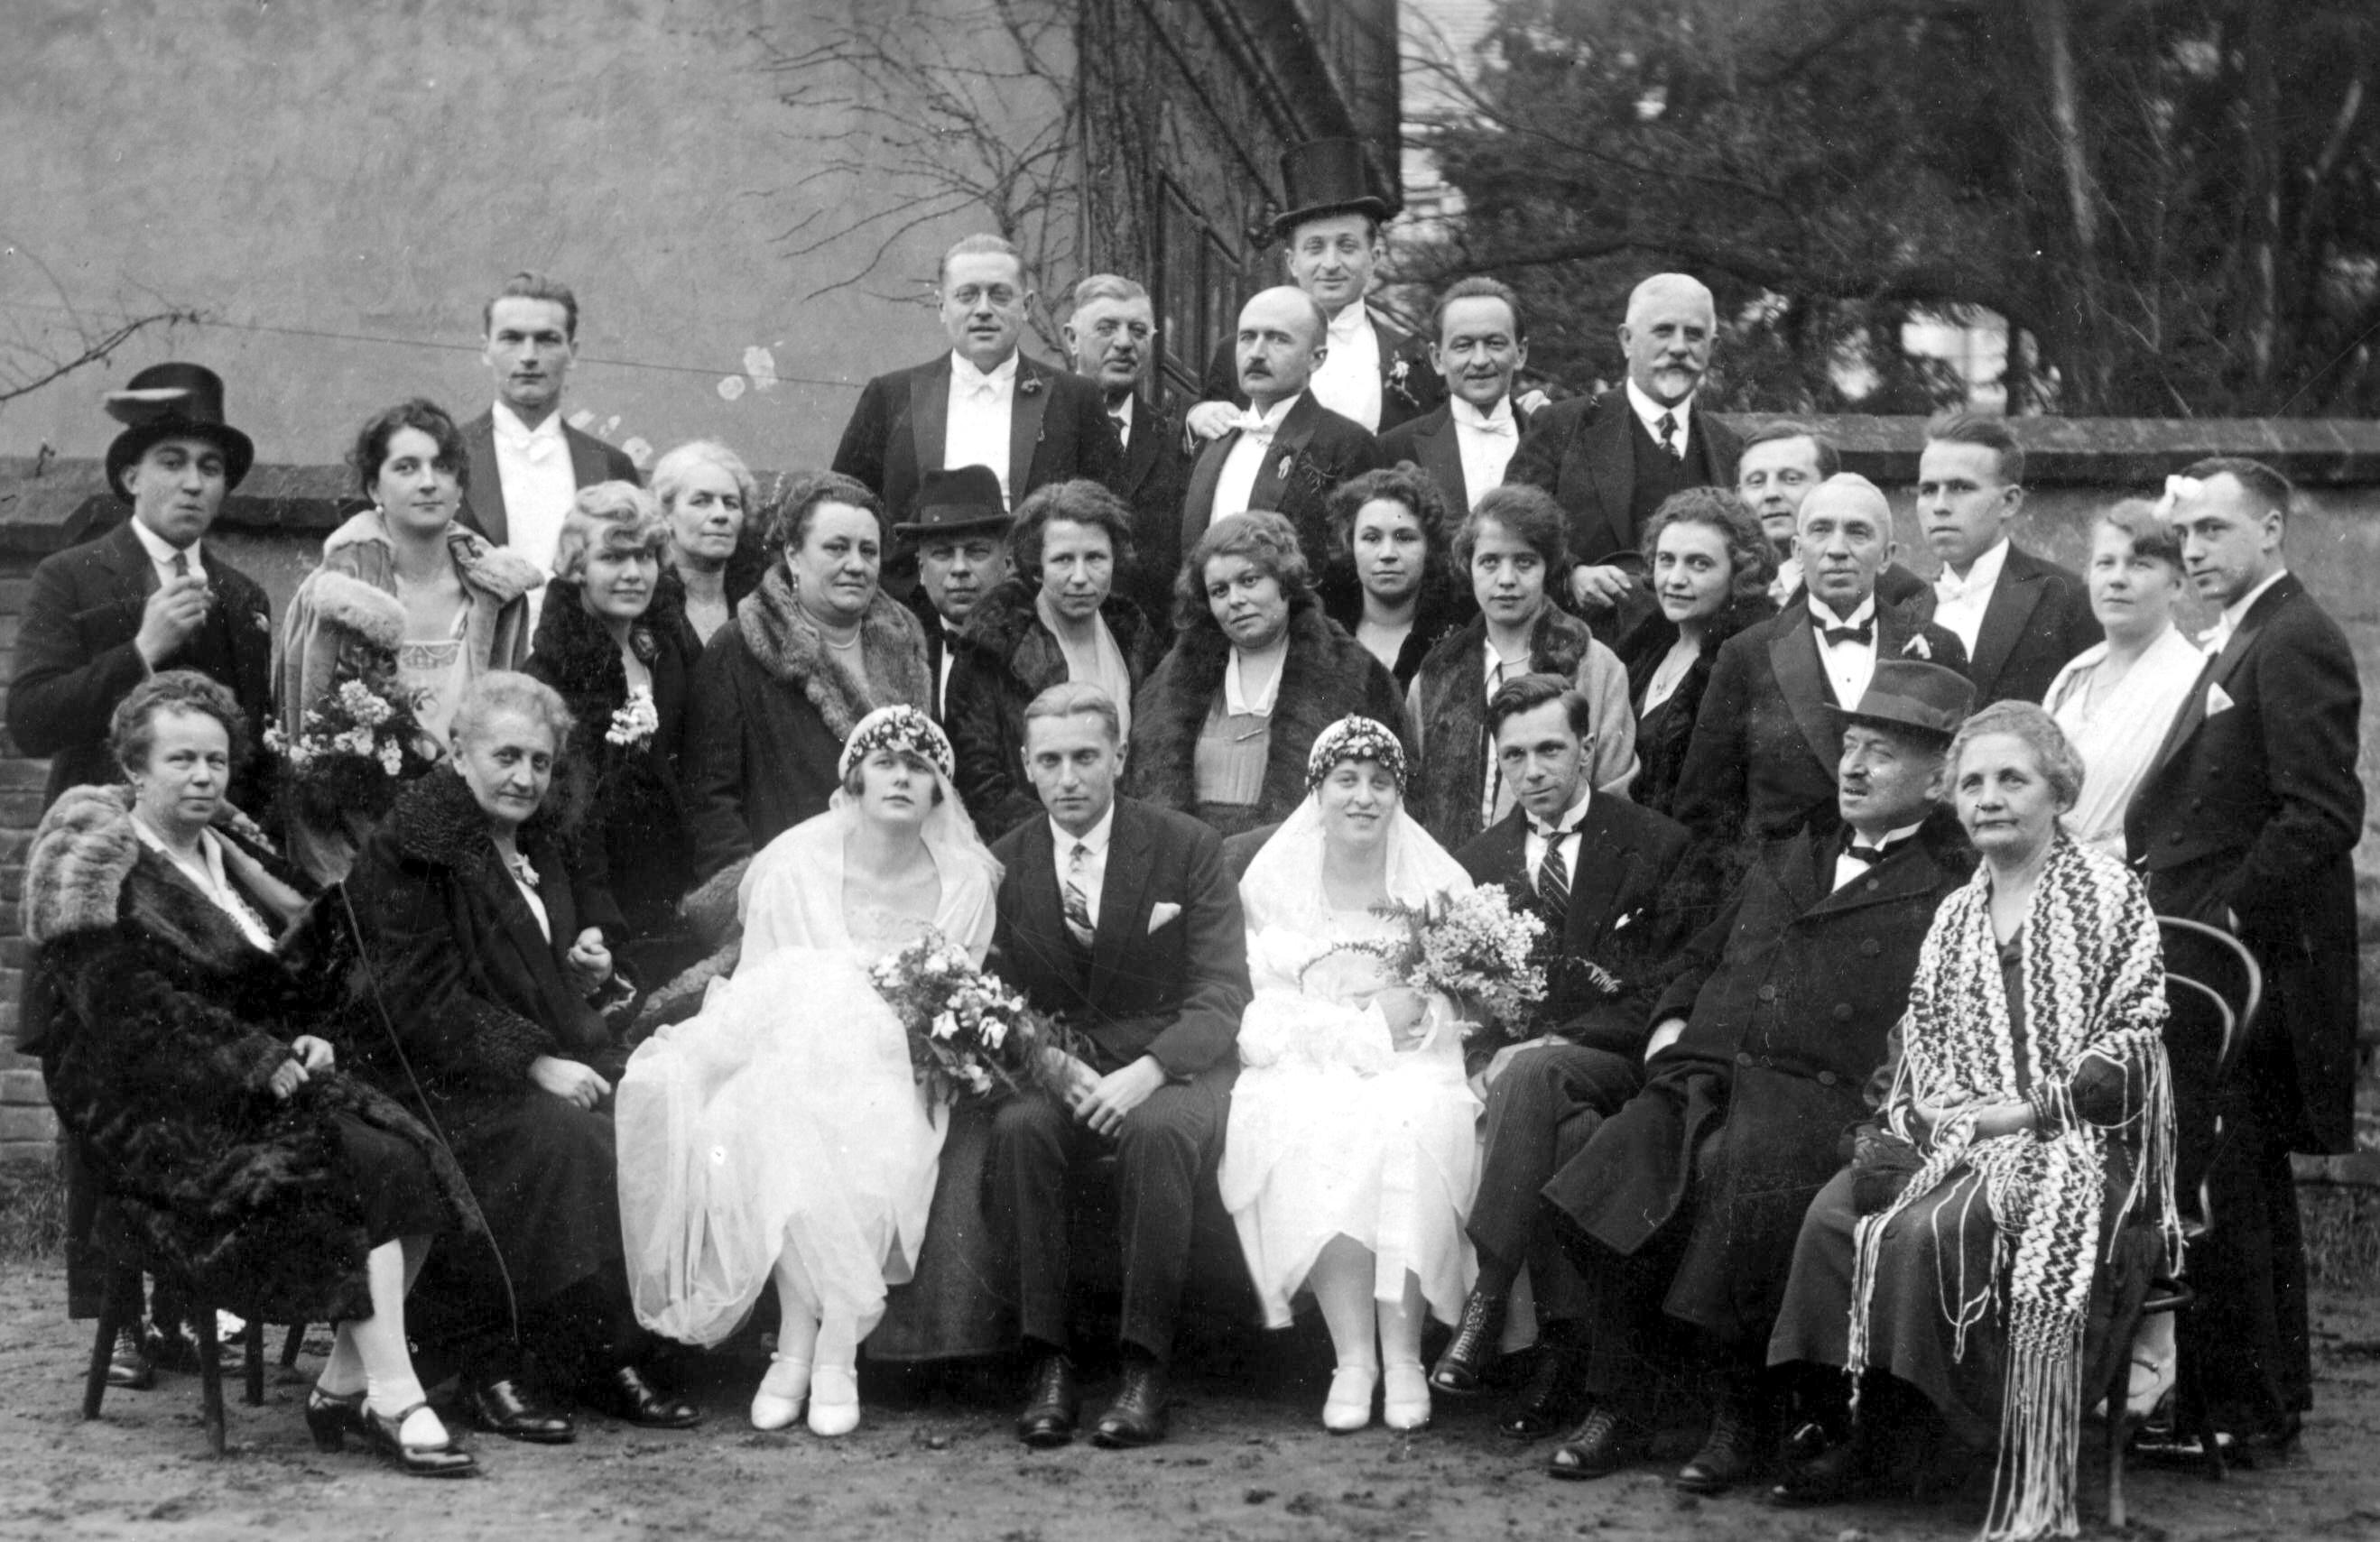 Fidrmuc Hochzeitsfeier